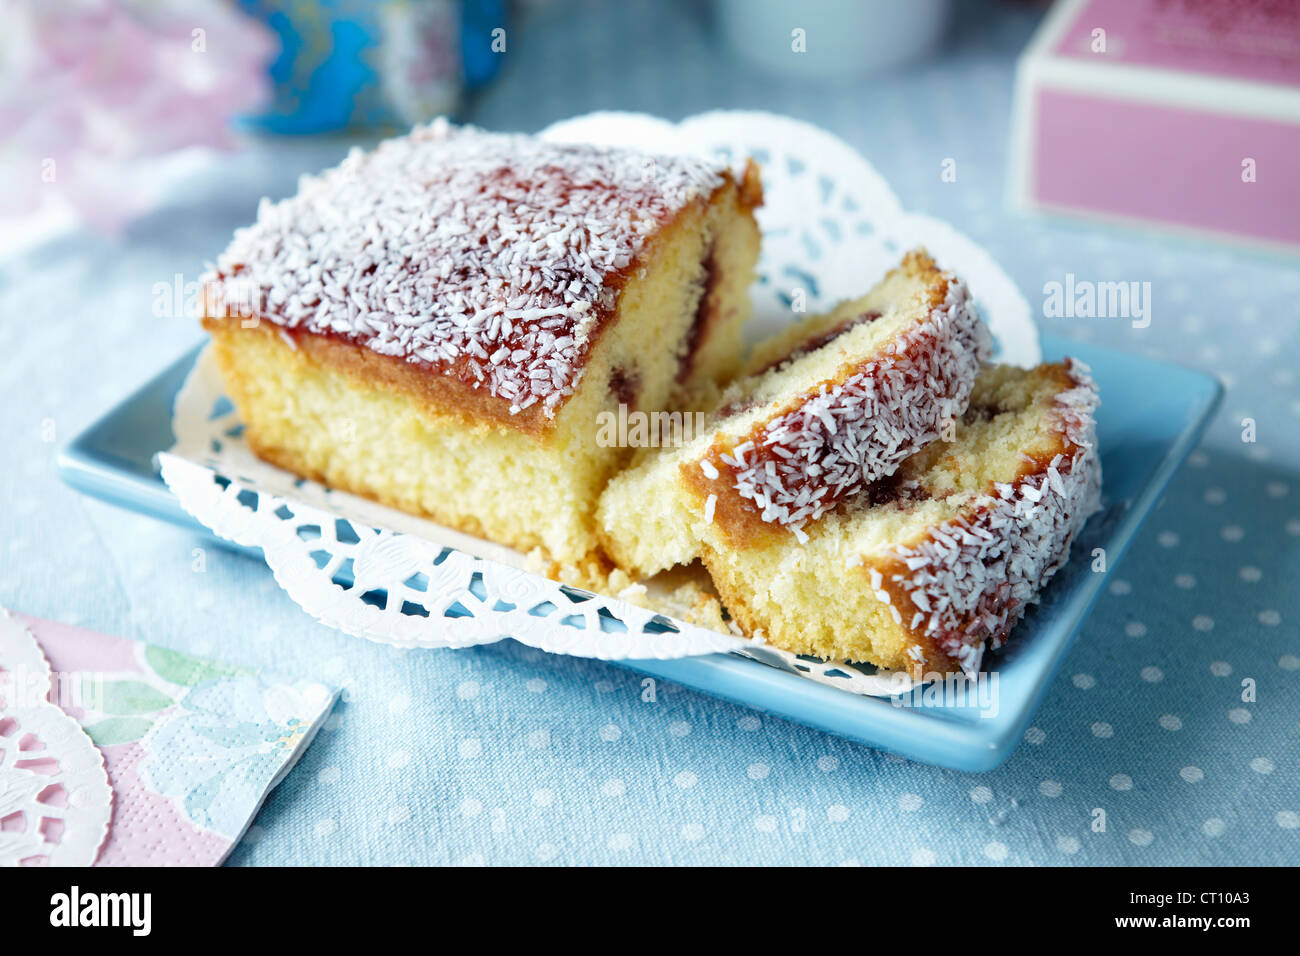 Plate of sliced fruit cake - Stock Image